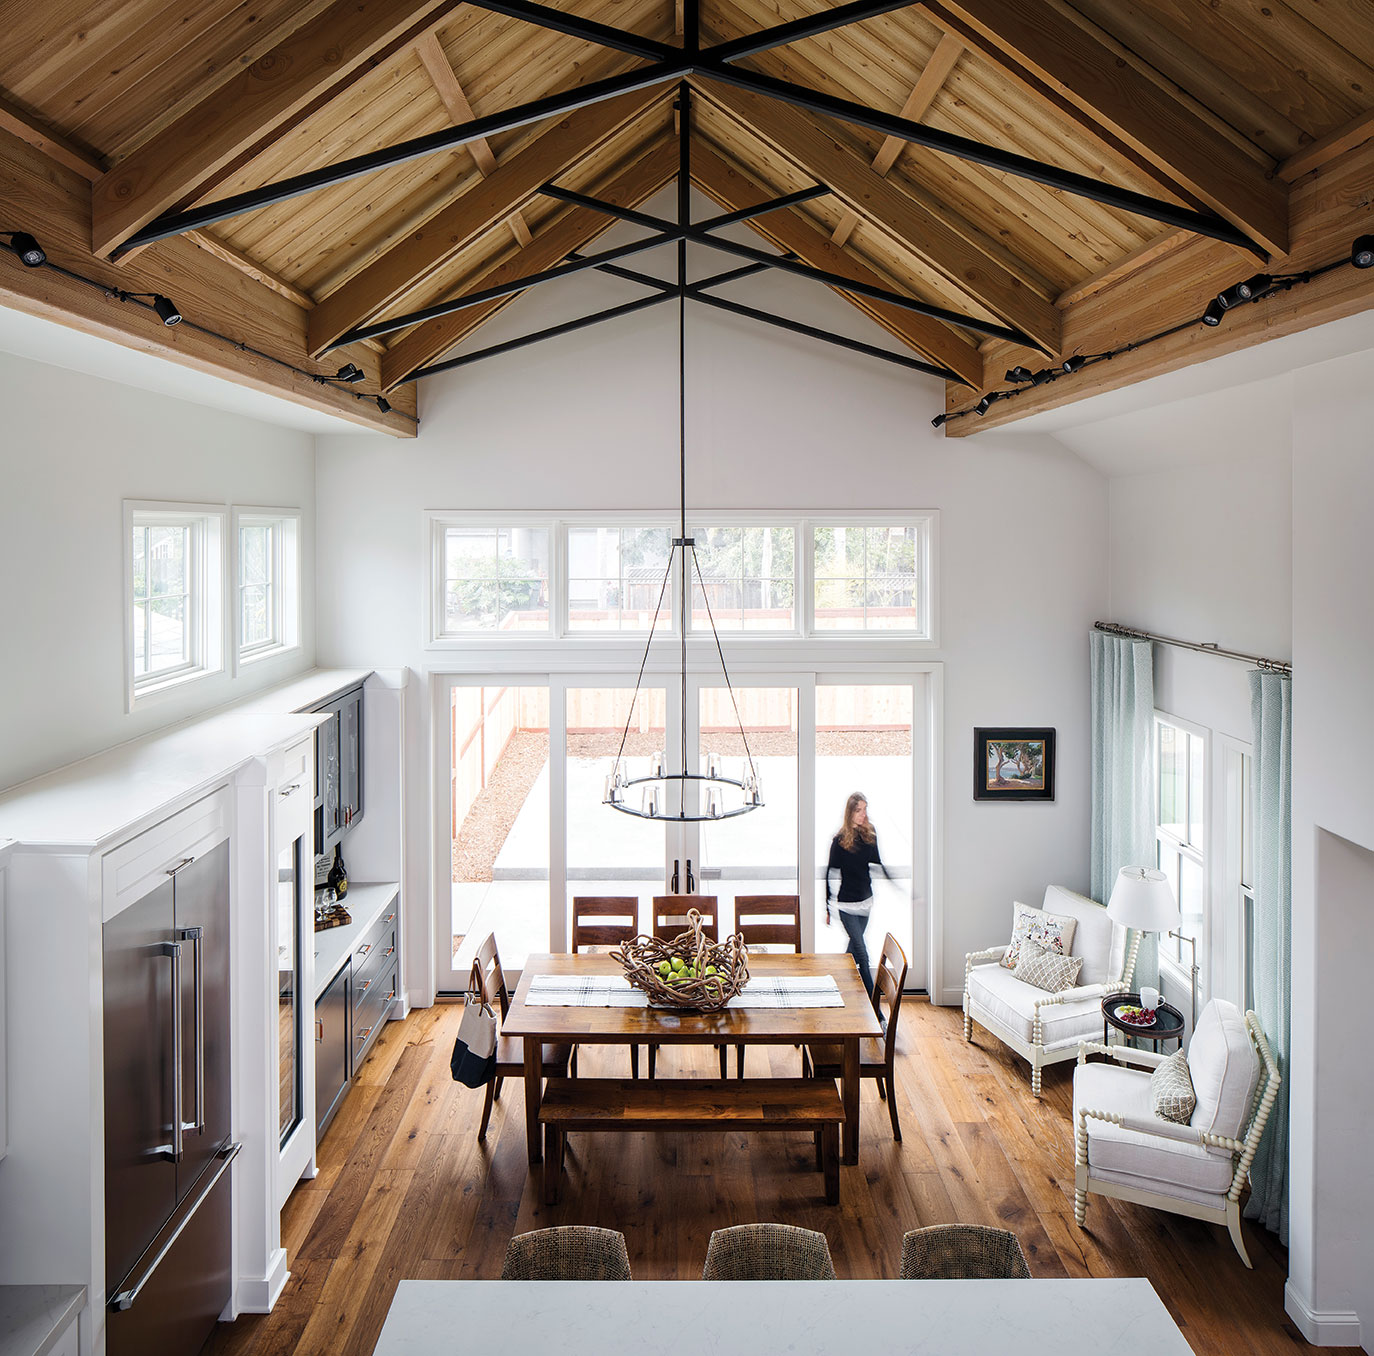 cedar ceiling in an open floorplan kitchen dining space in leucadia near san diego